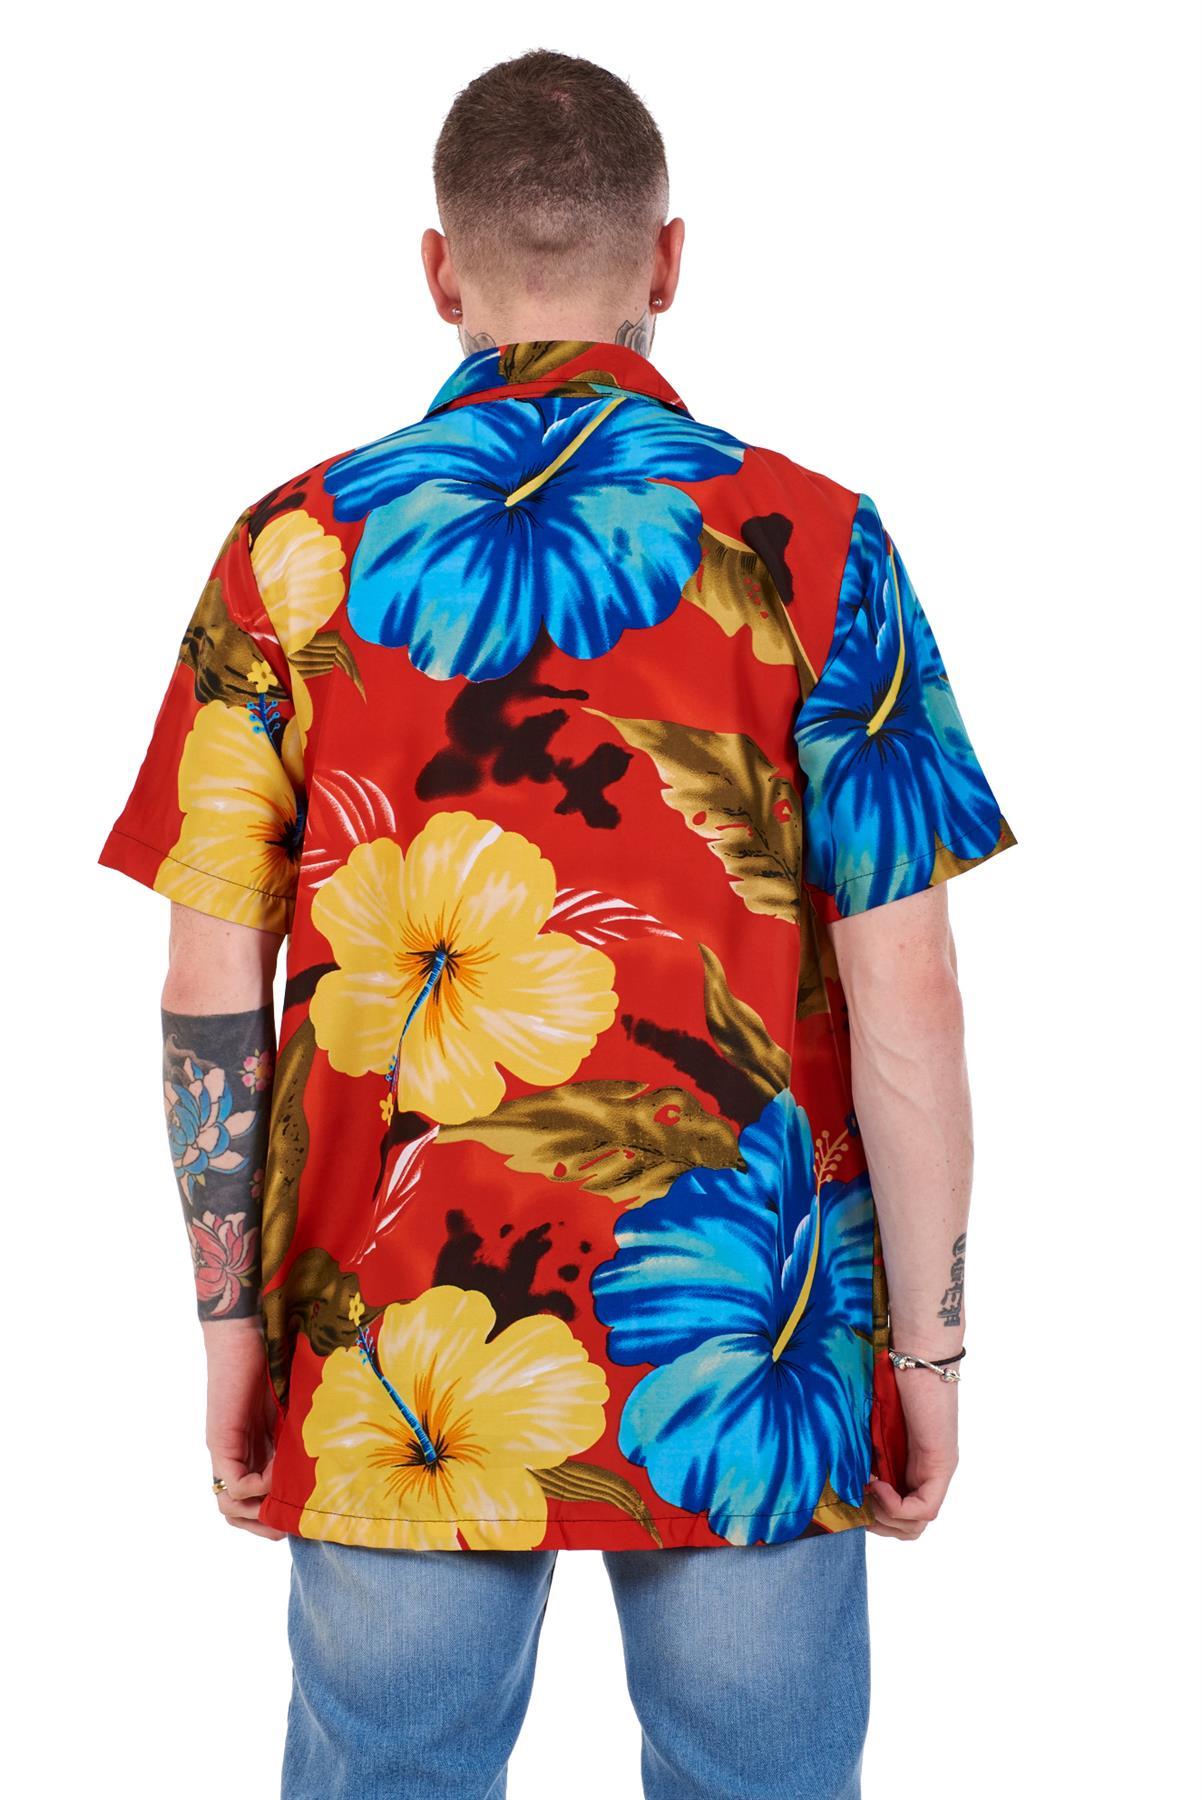 Mens-Hawaiian-Shirt-Multi-Colors-Print-Regular-Big-Size-Summer-Fancy-Dress-M-5XL thumbnail 37